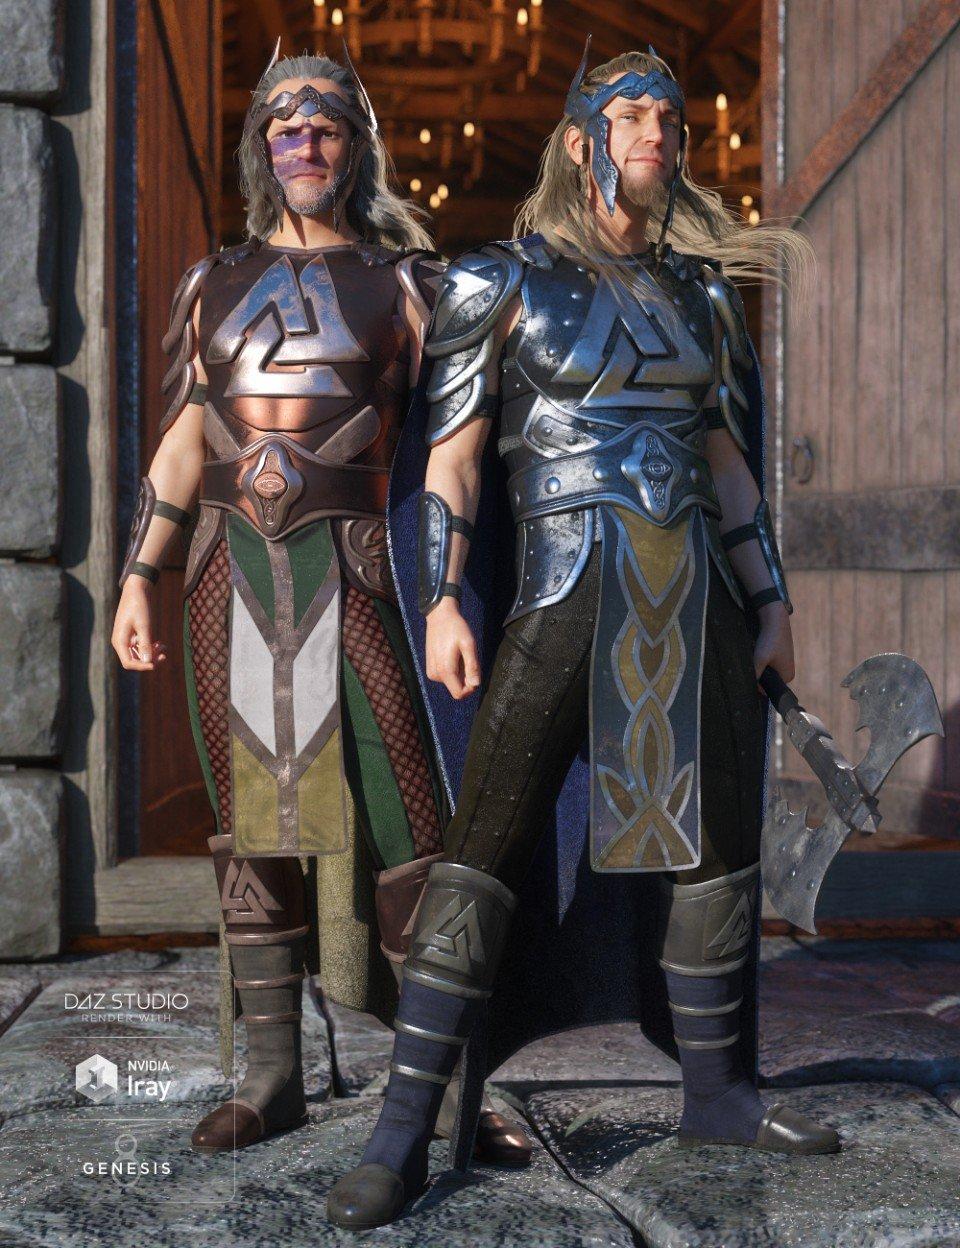 dForce Warrior King Outfit Textures_DAZ3D下载站